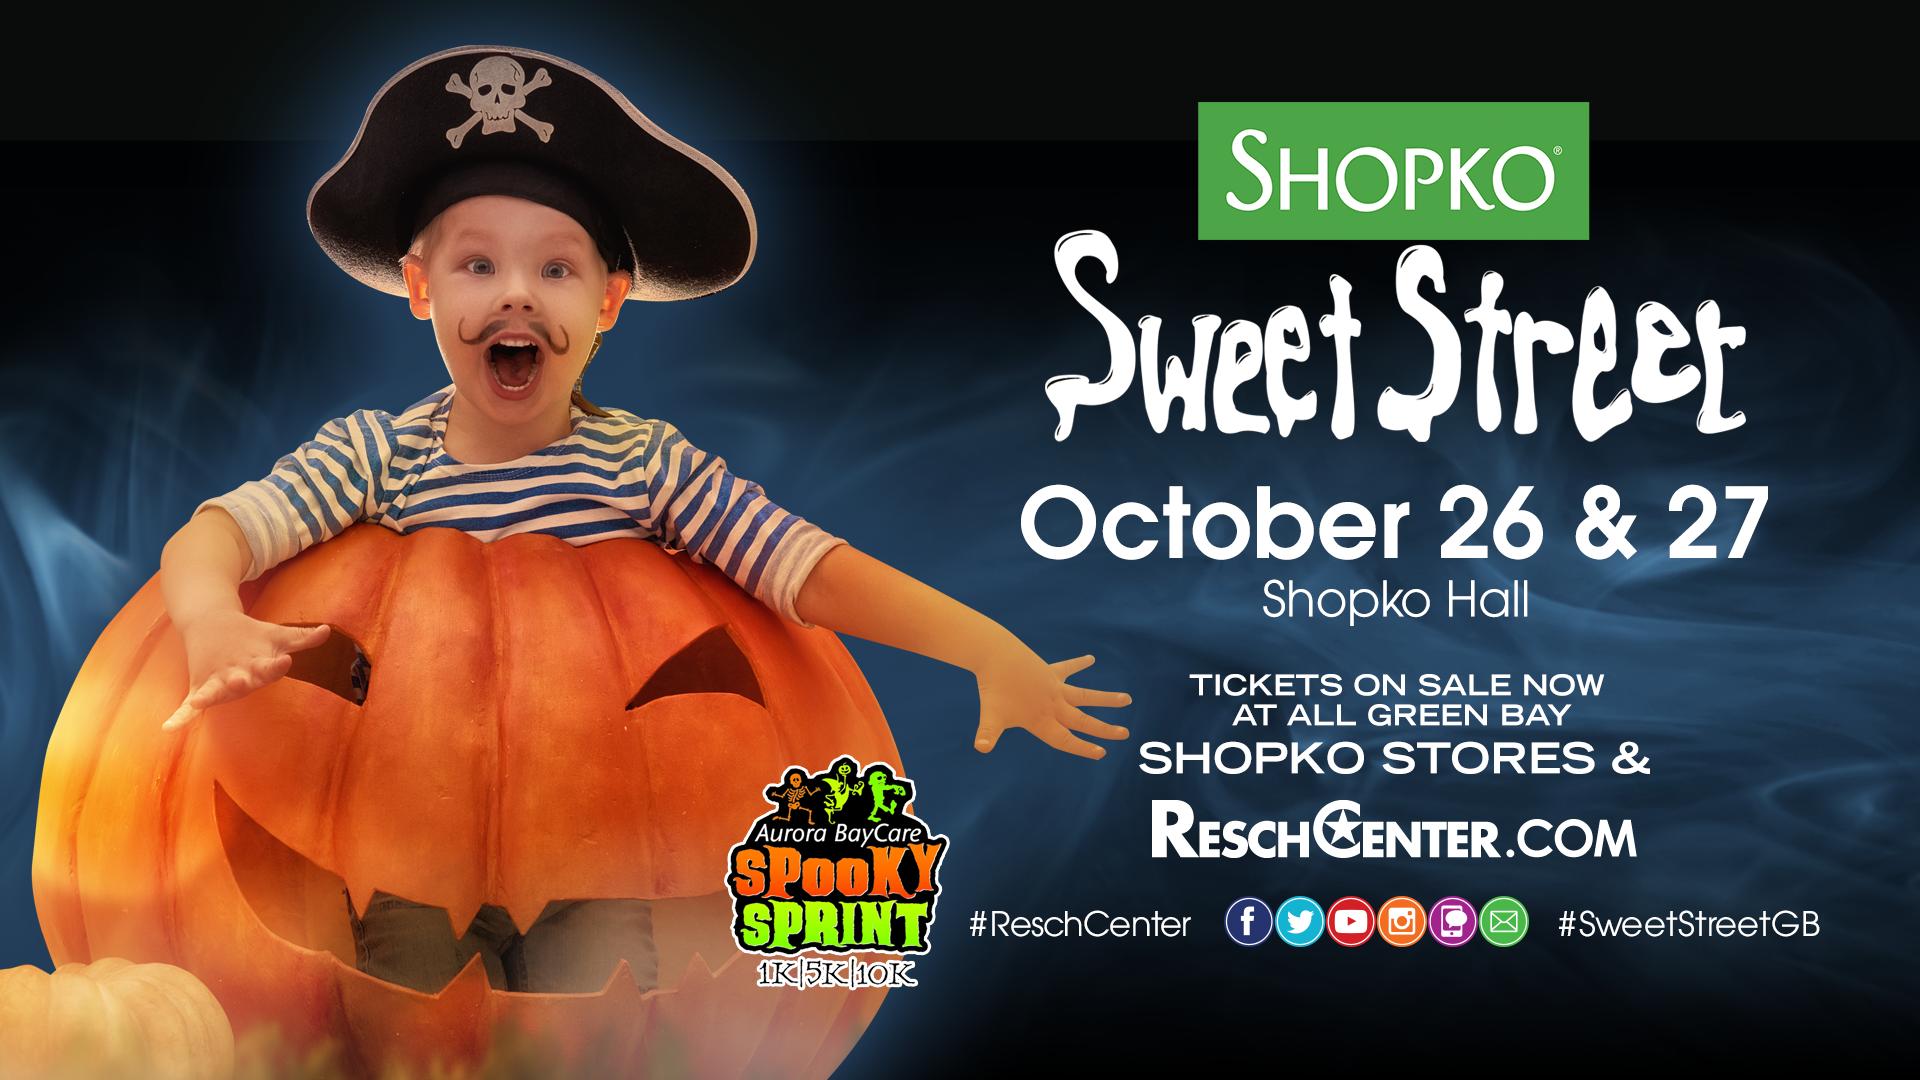 CONTEST: Shopko Sweet Street